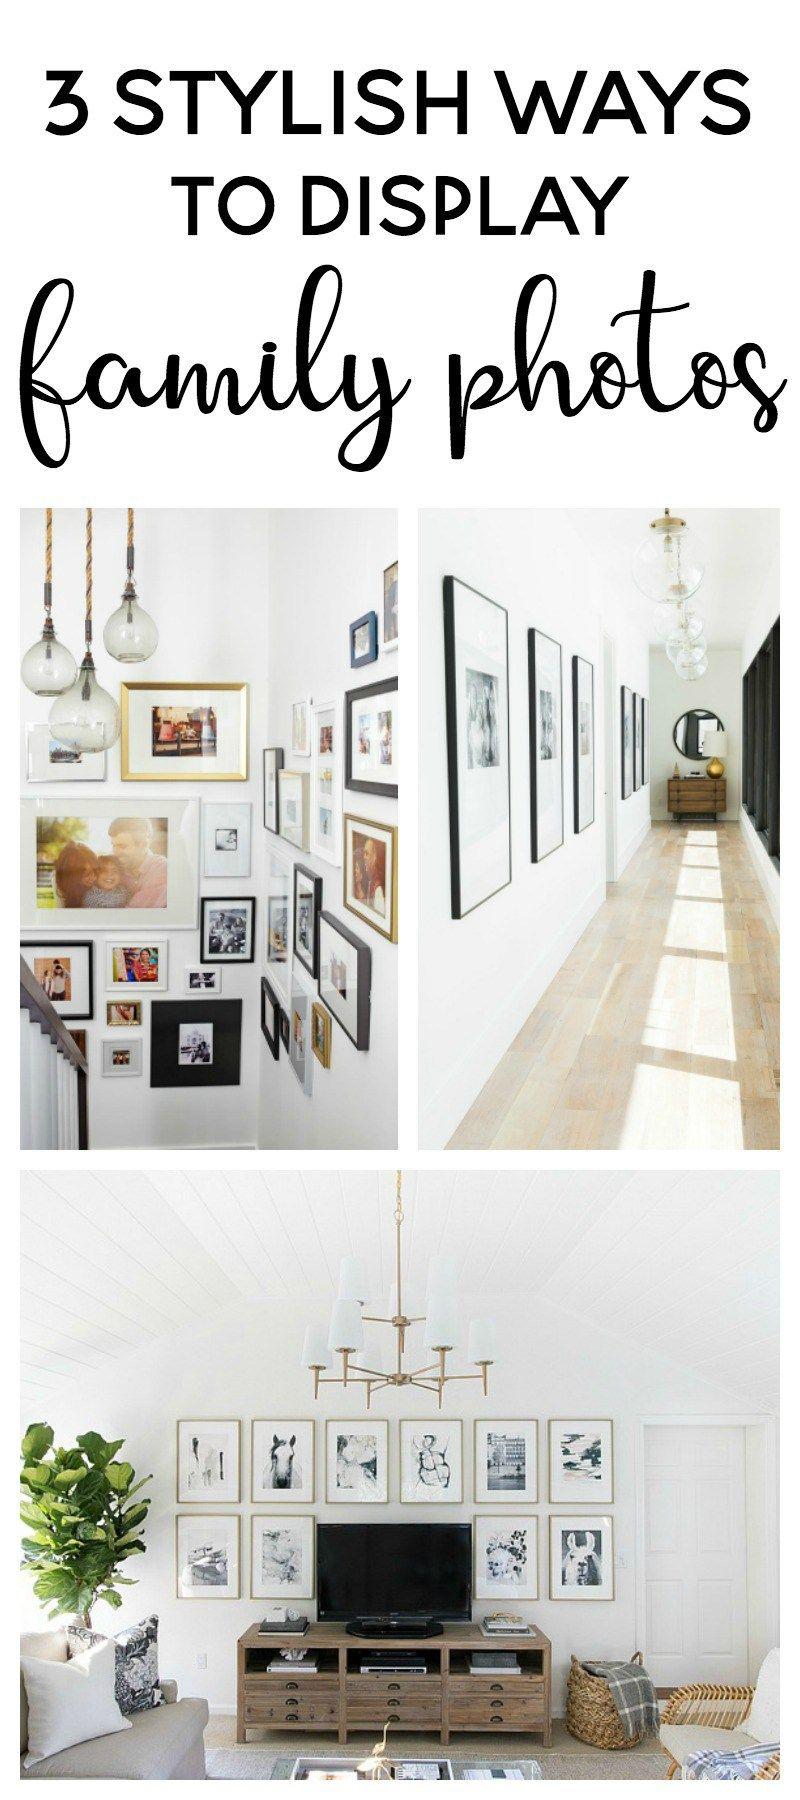 3 stylish ways to display family photos fixer upper farmhouse rh pinterest com